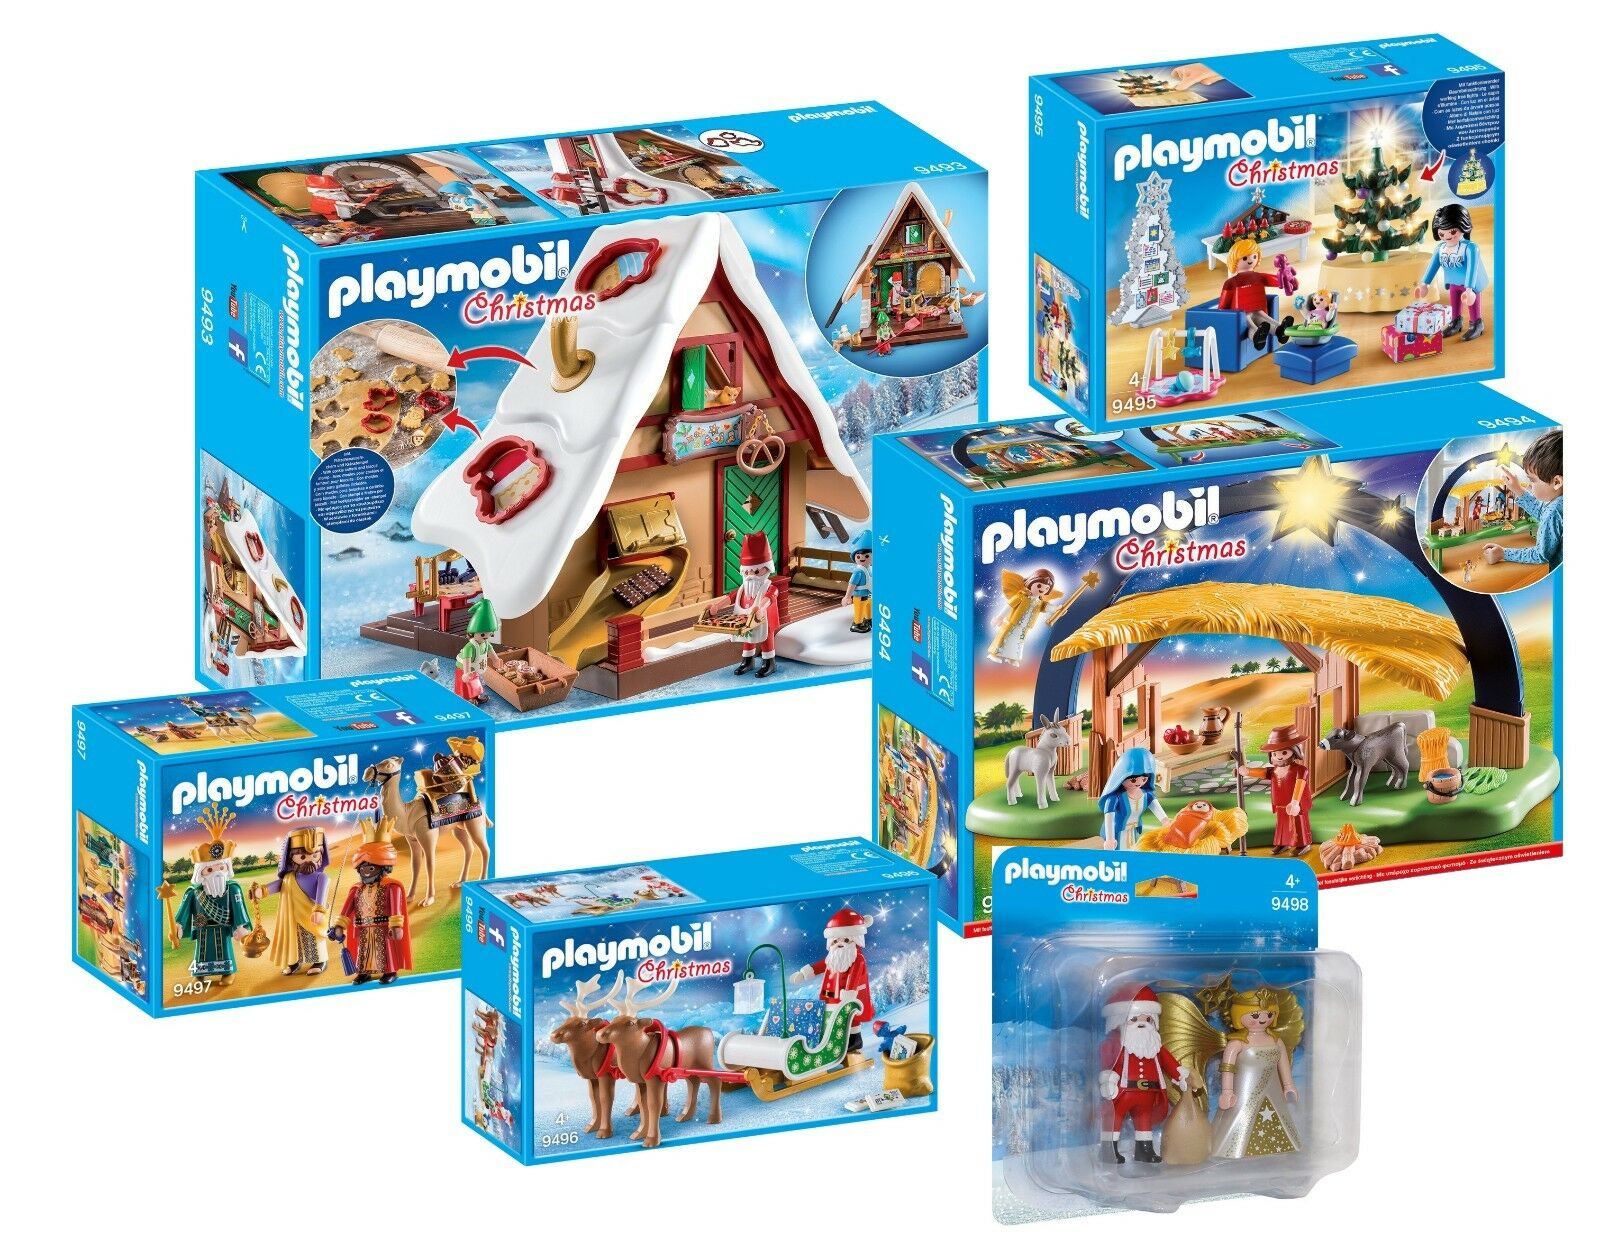 PLAYMOBIL® PLAYMOBIL® PLAYMOBIL® Weihnachts-Komplettset  9493 9494 9495 9496 9497 9497 Neu 0cbbca